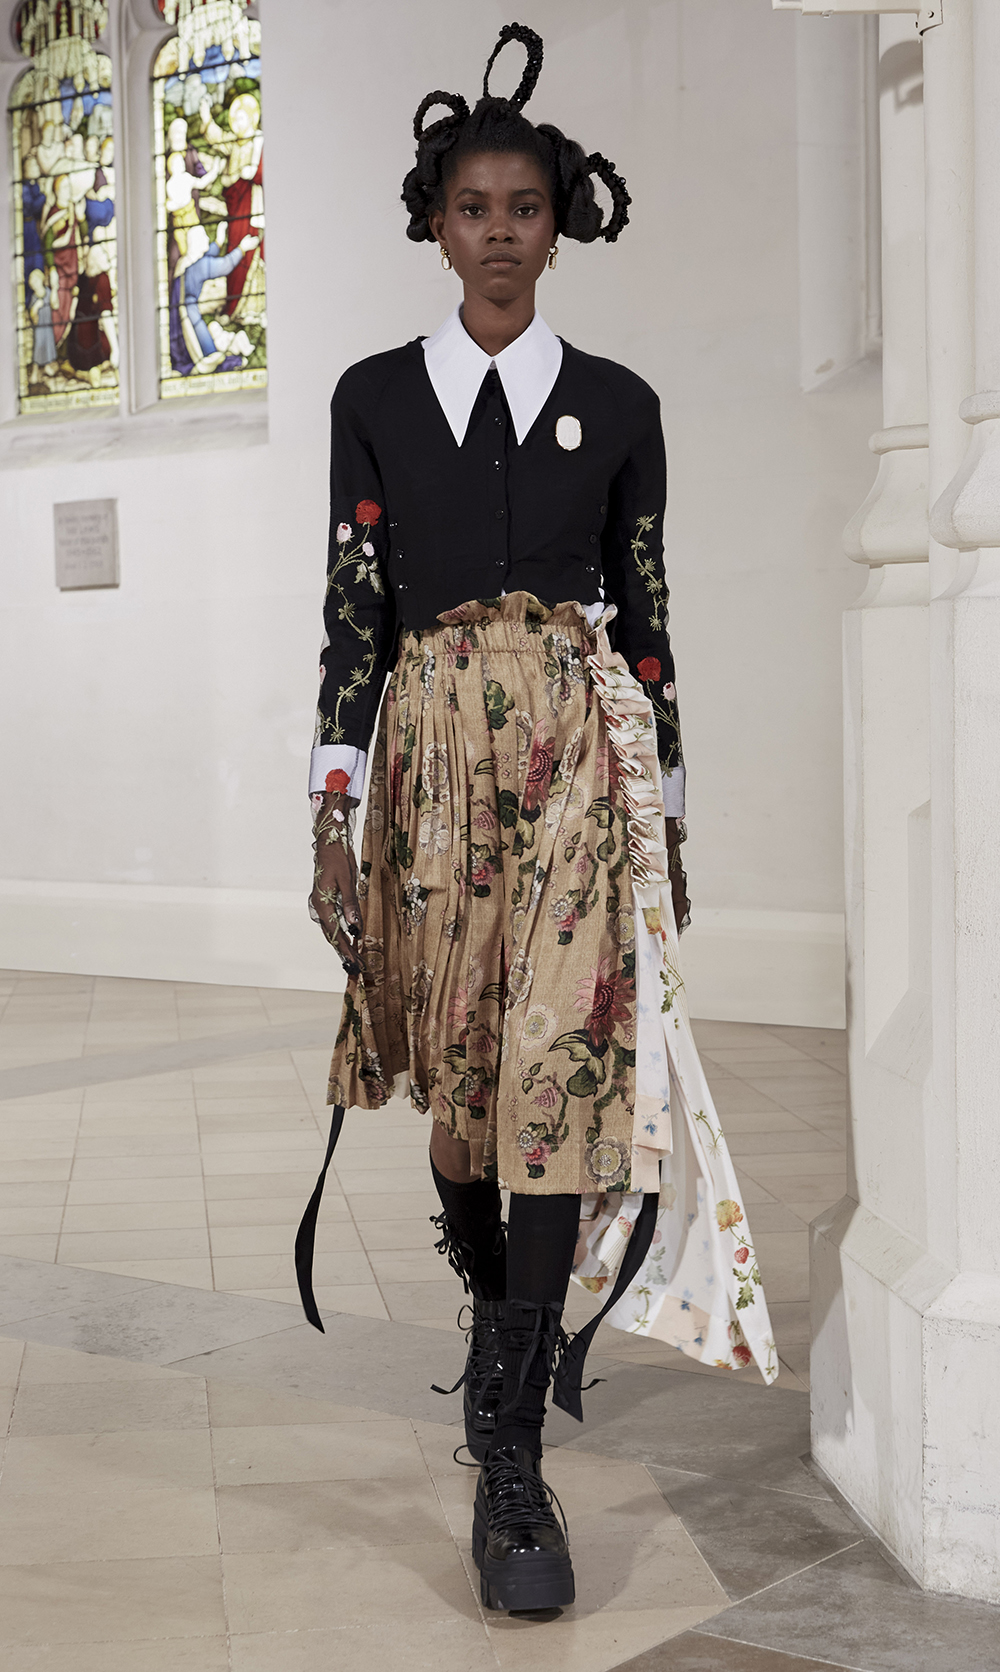 Best LFW Looks I Simone Rocha Fall 2021 #fashionblog #fashionable #womensfashion